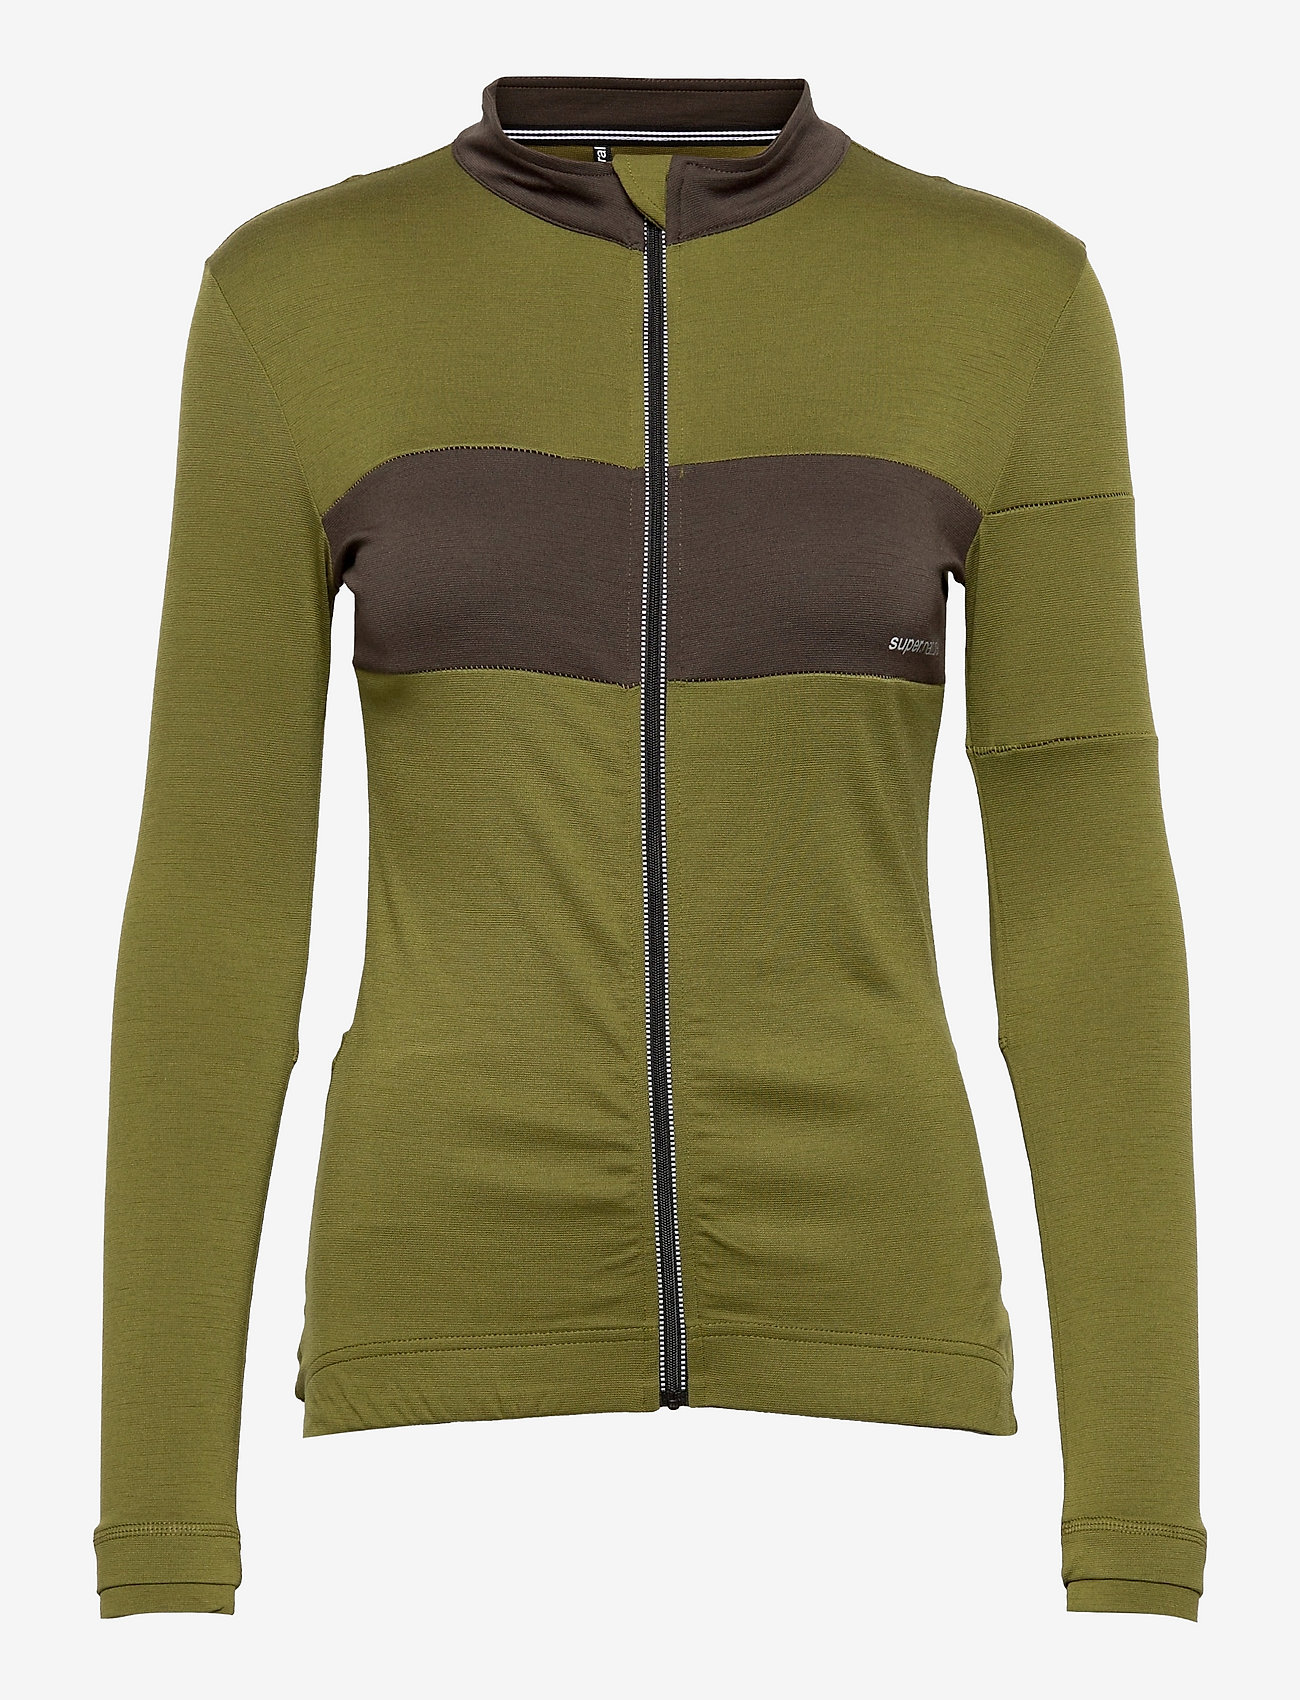 super.natural - W GRAVA LS JERSEY - sweatshirts - avocado/wren - 0